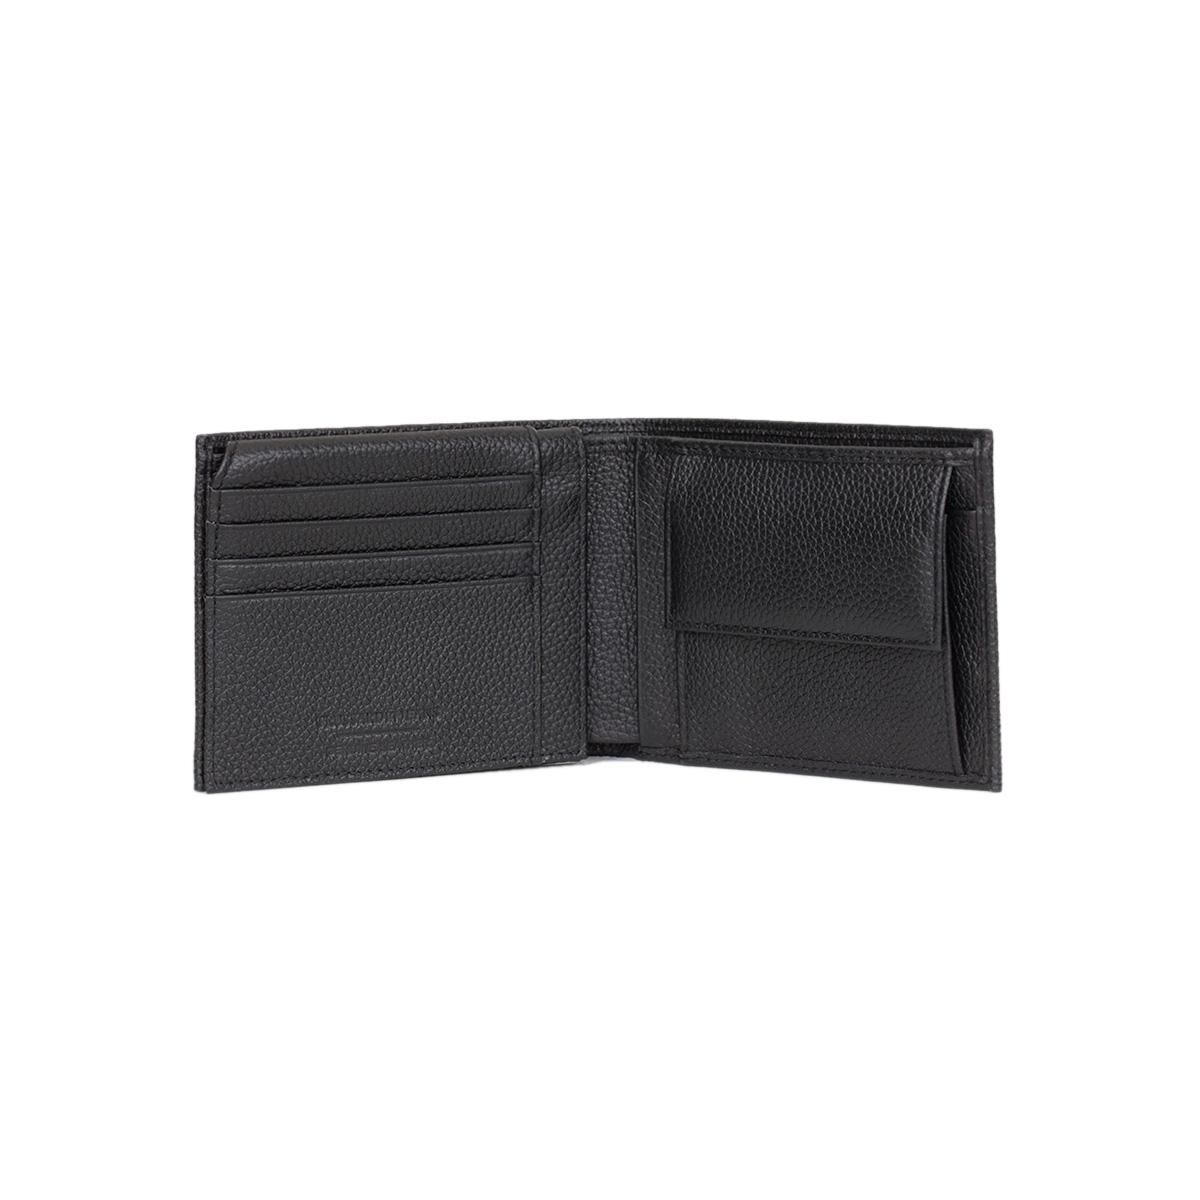 996cf01ea6 Δερμάτινο Πορτοφόλι Μεγάλο Trussardi Jeans Flap Coin Pocket Tumbled  71W00001 Μαύρο